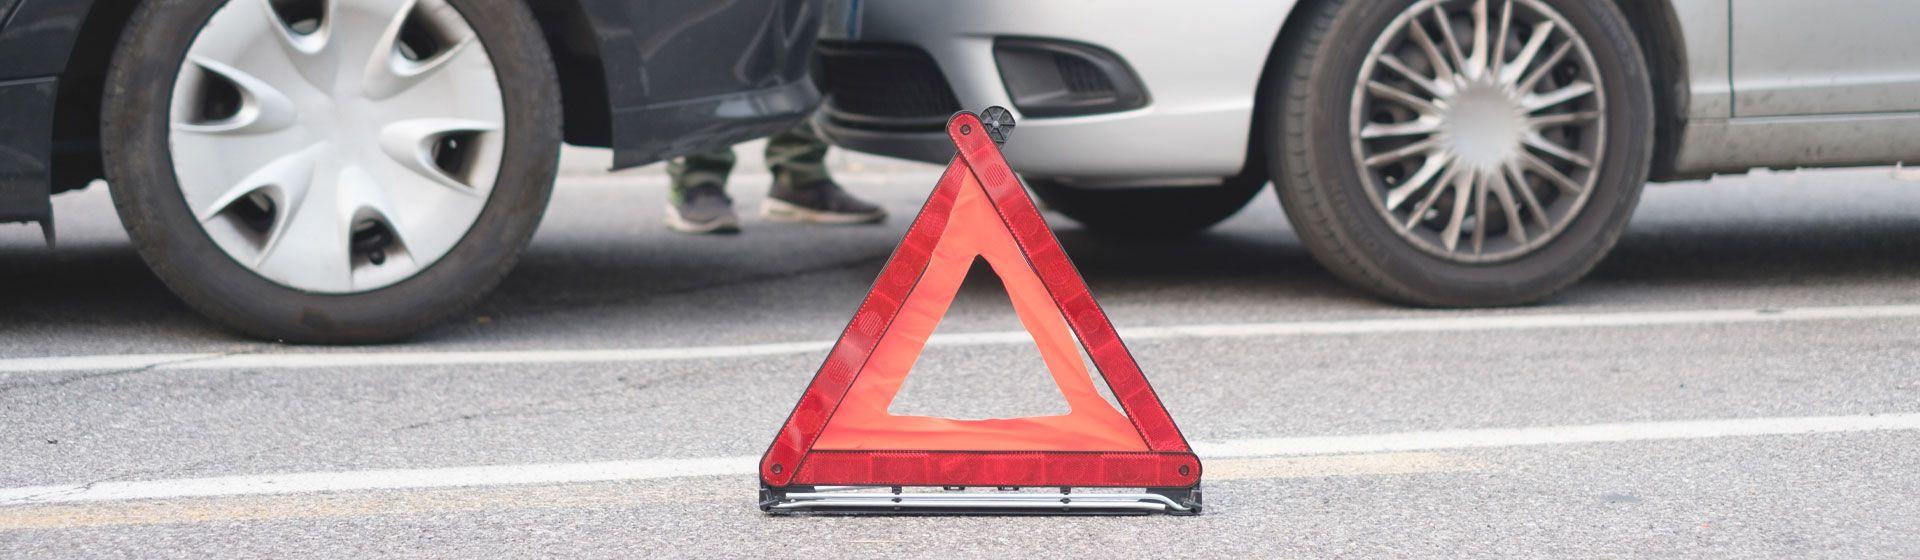 Nutzungsausfallentschädigung nach Autounfall